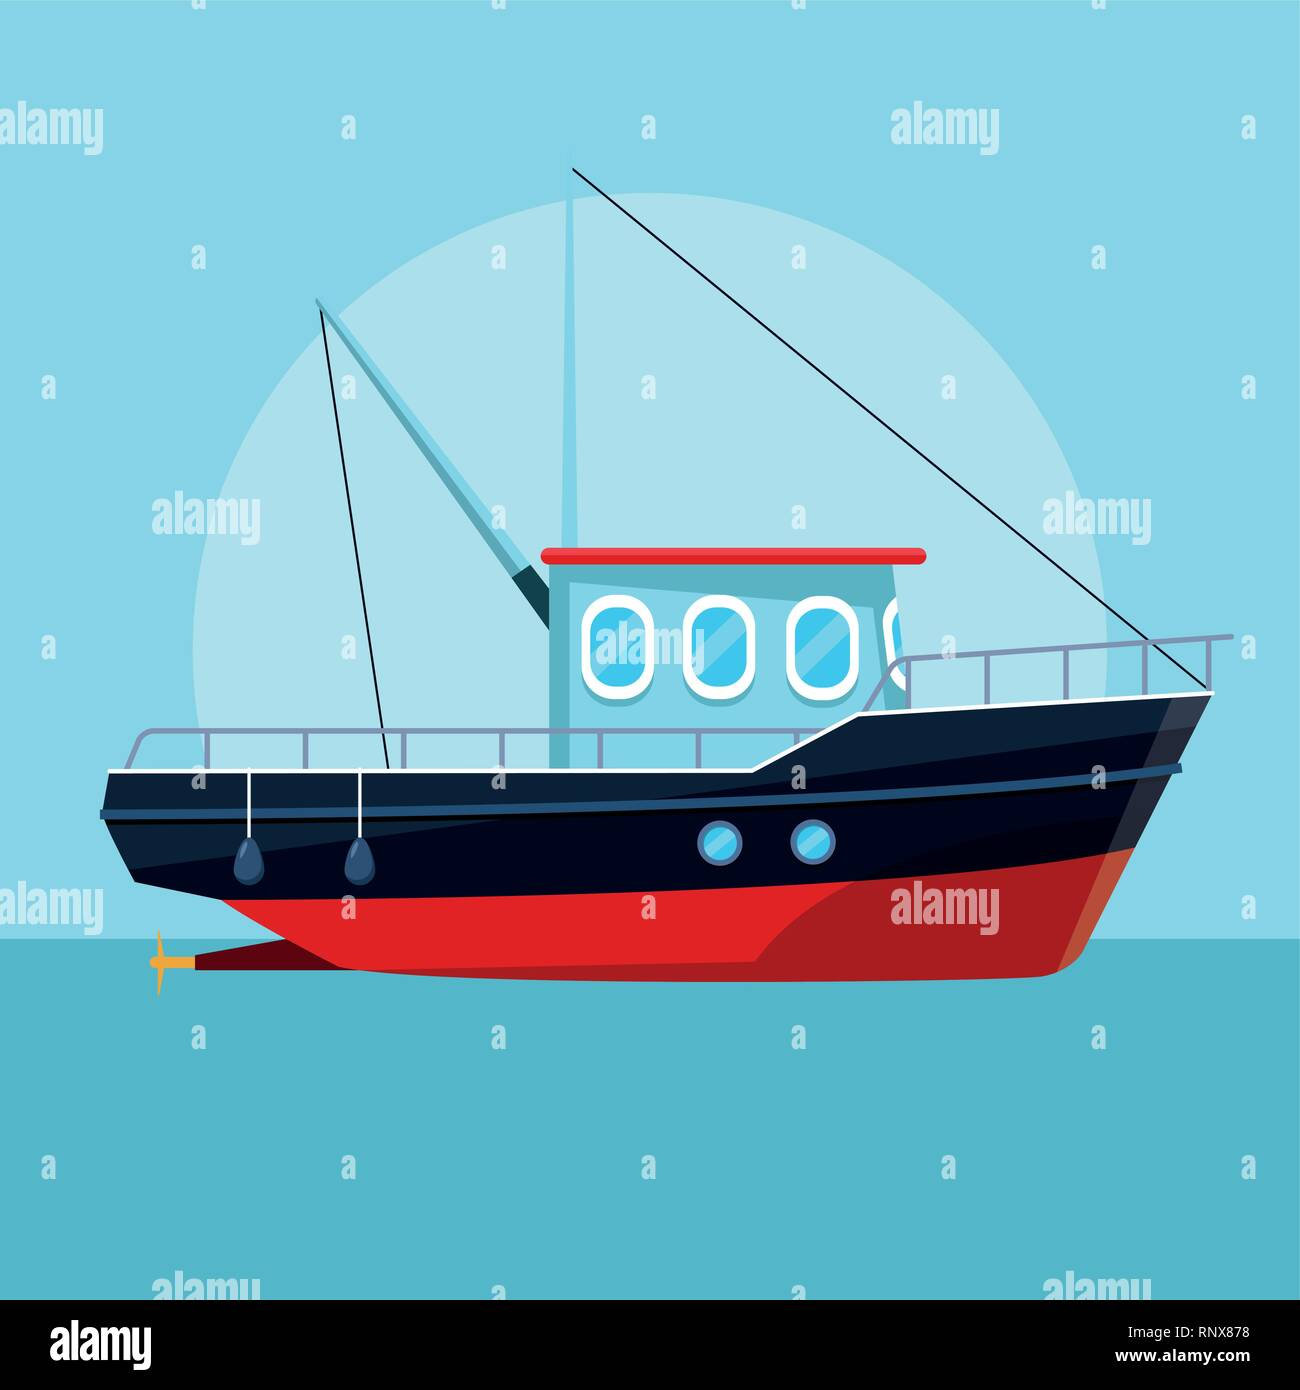 fishing boat cartoon - Stock Image